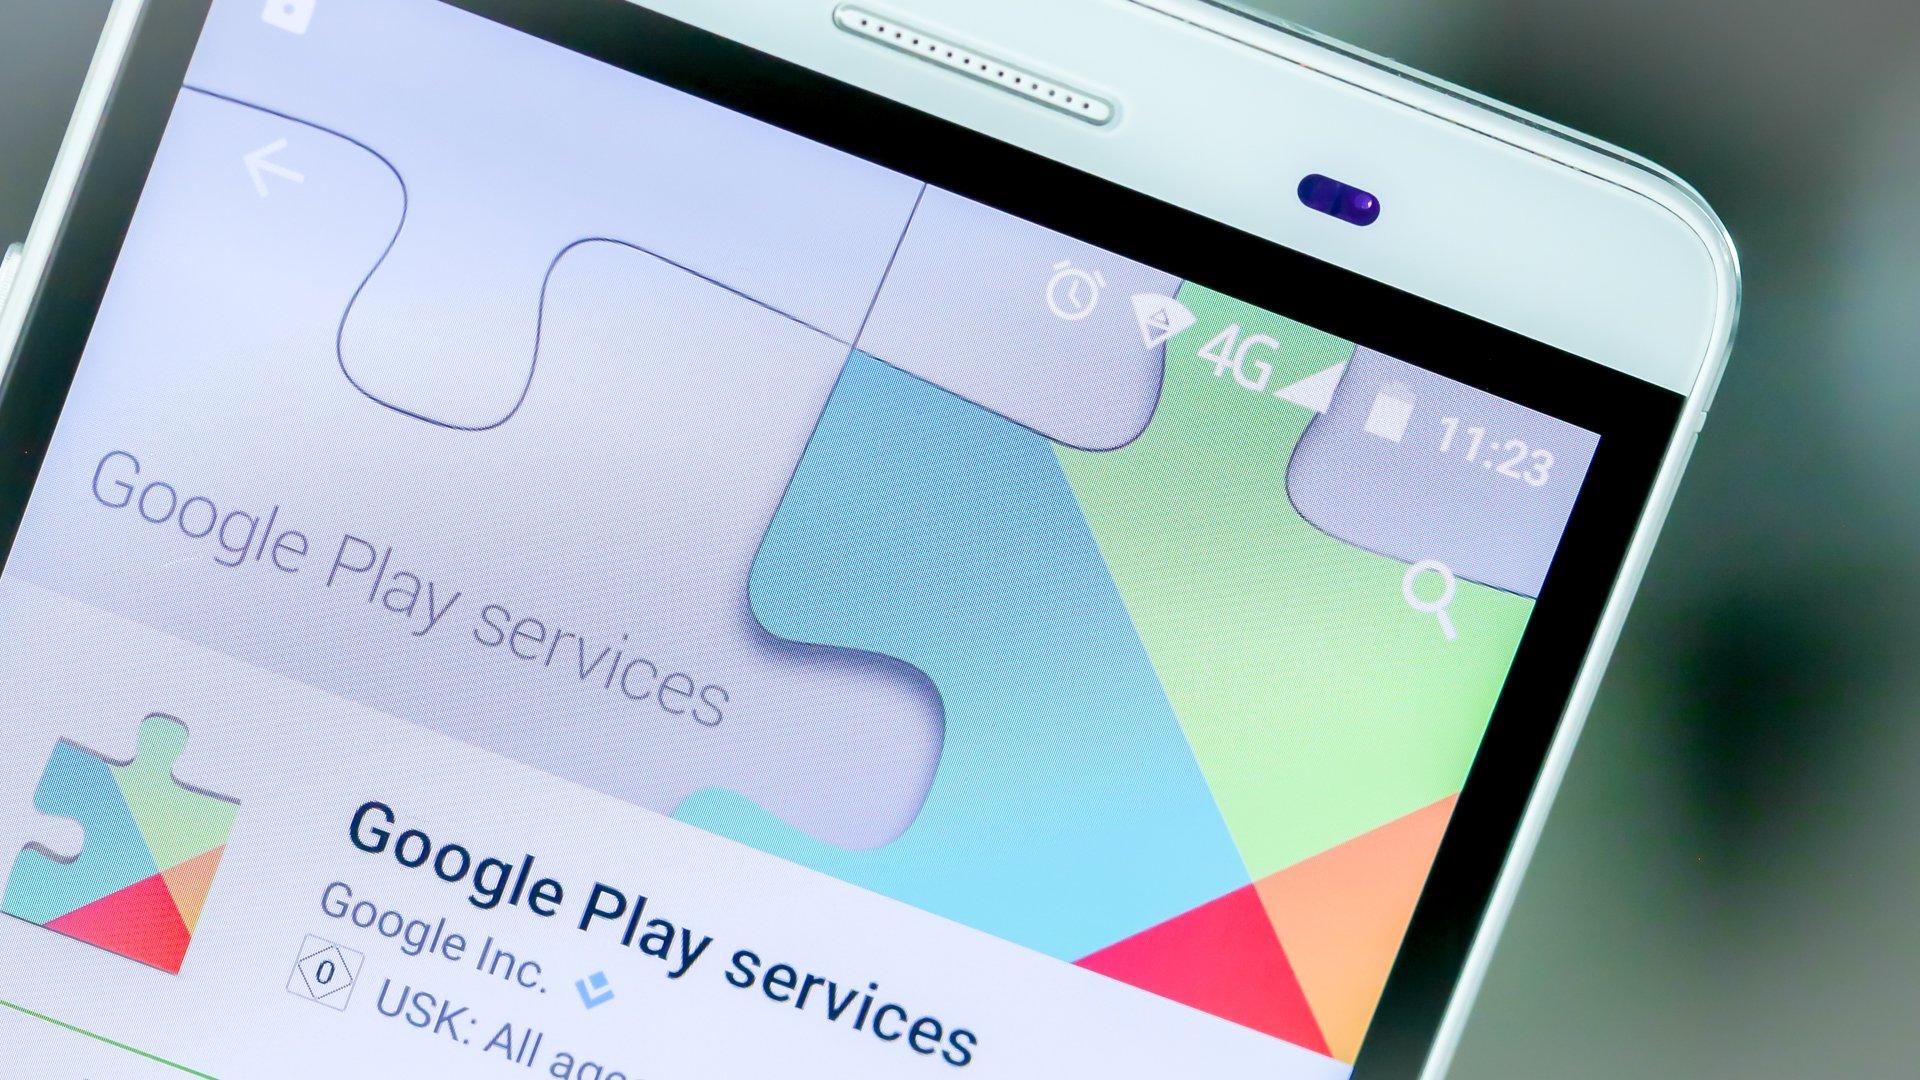 Come disinstallare Google Play Services 1